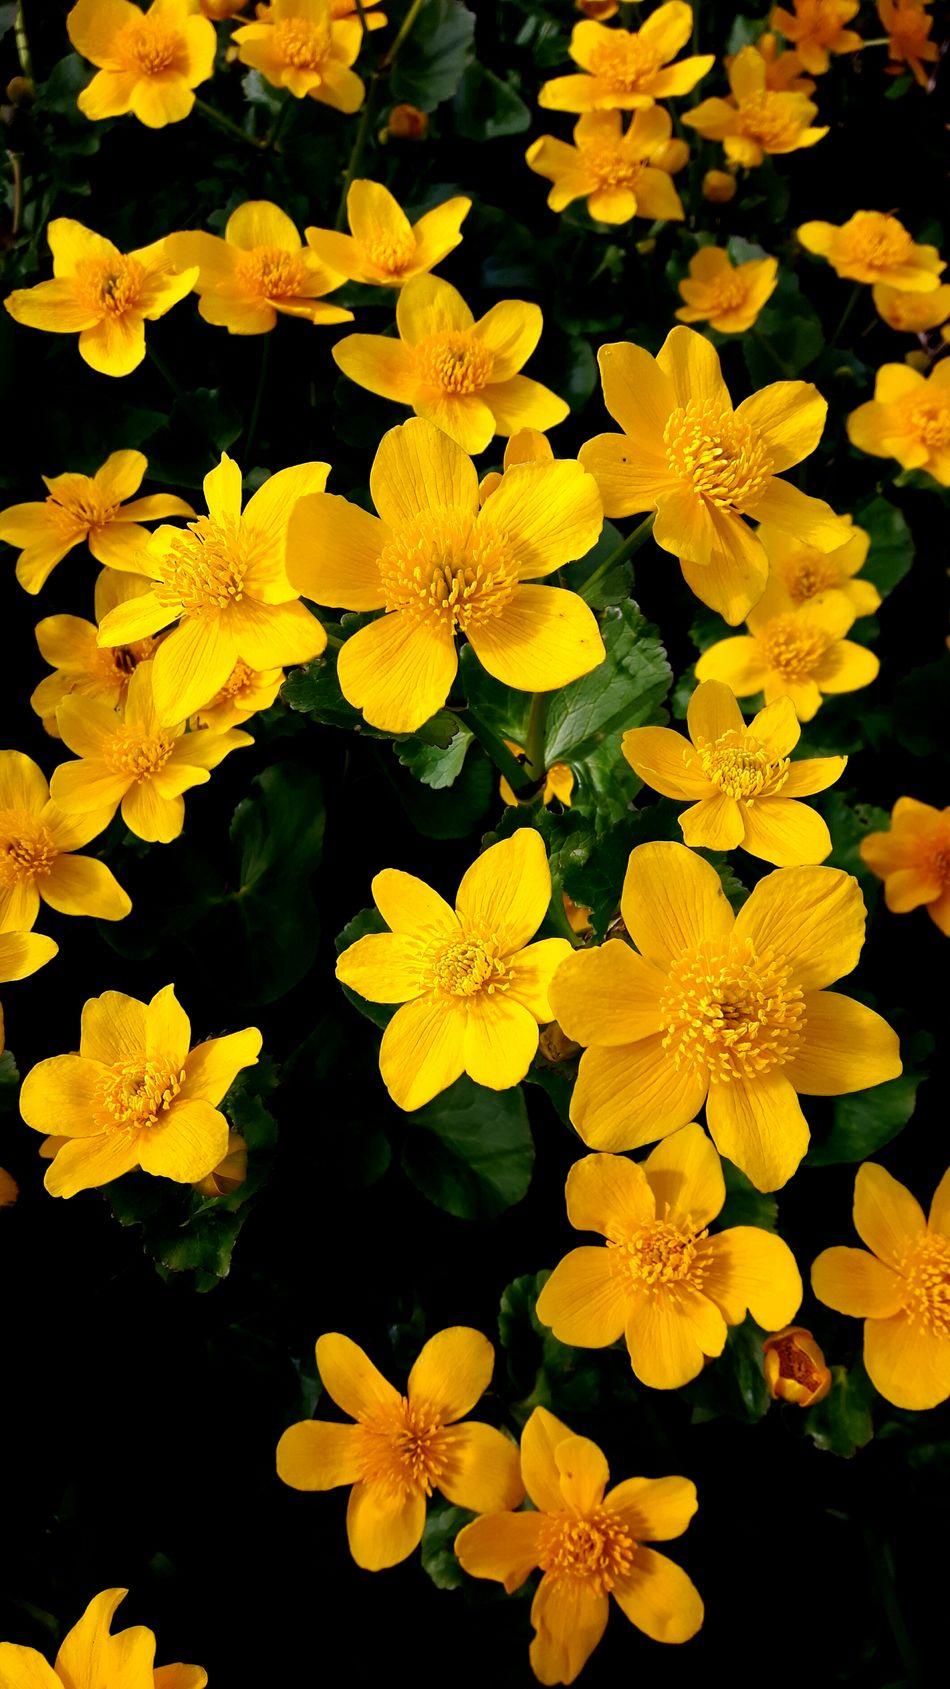 Dotterbloemen Dotterbloem Marsh Marigold Yellow Flower Beauty In Nature Nature Fragility Freshness Spring Flowers